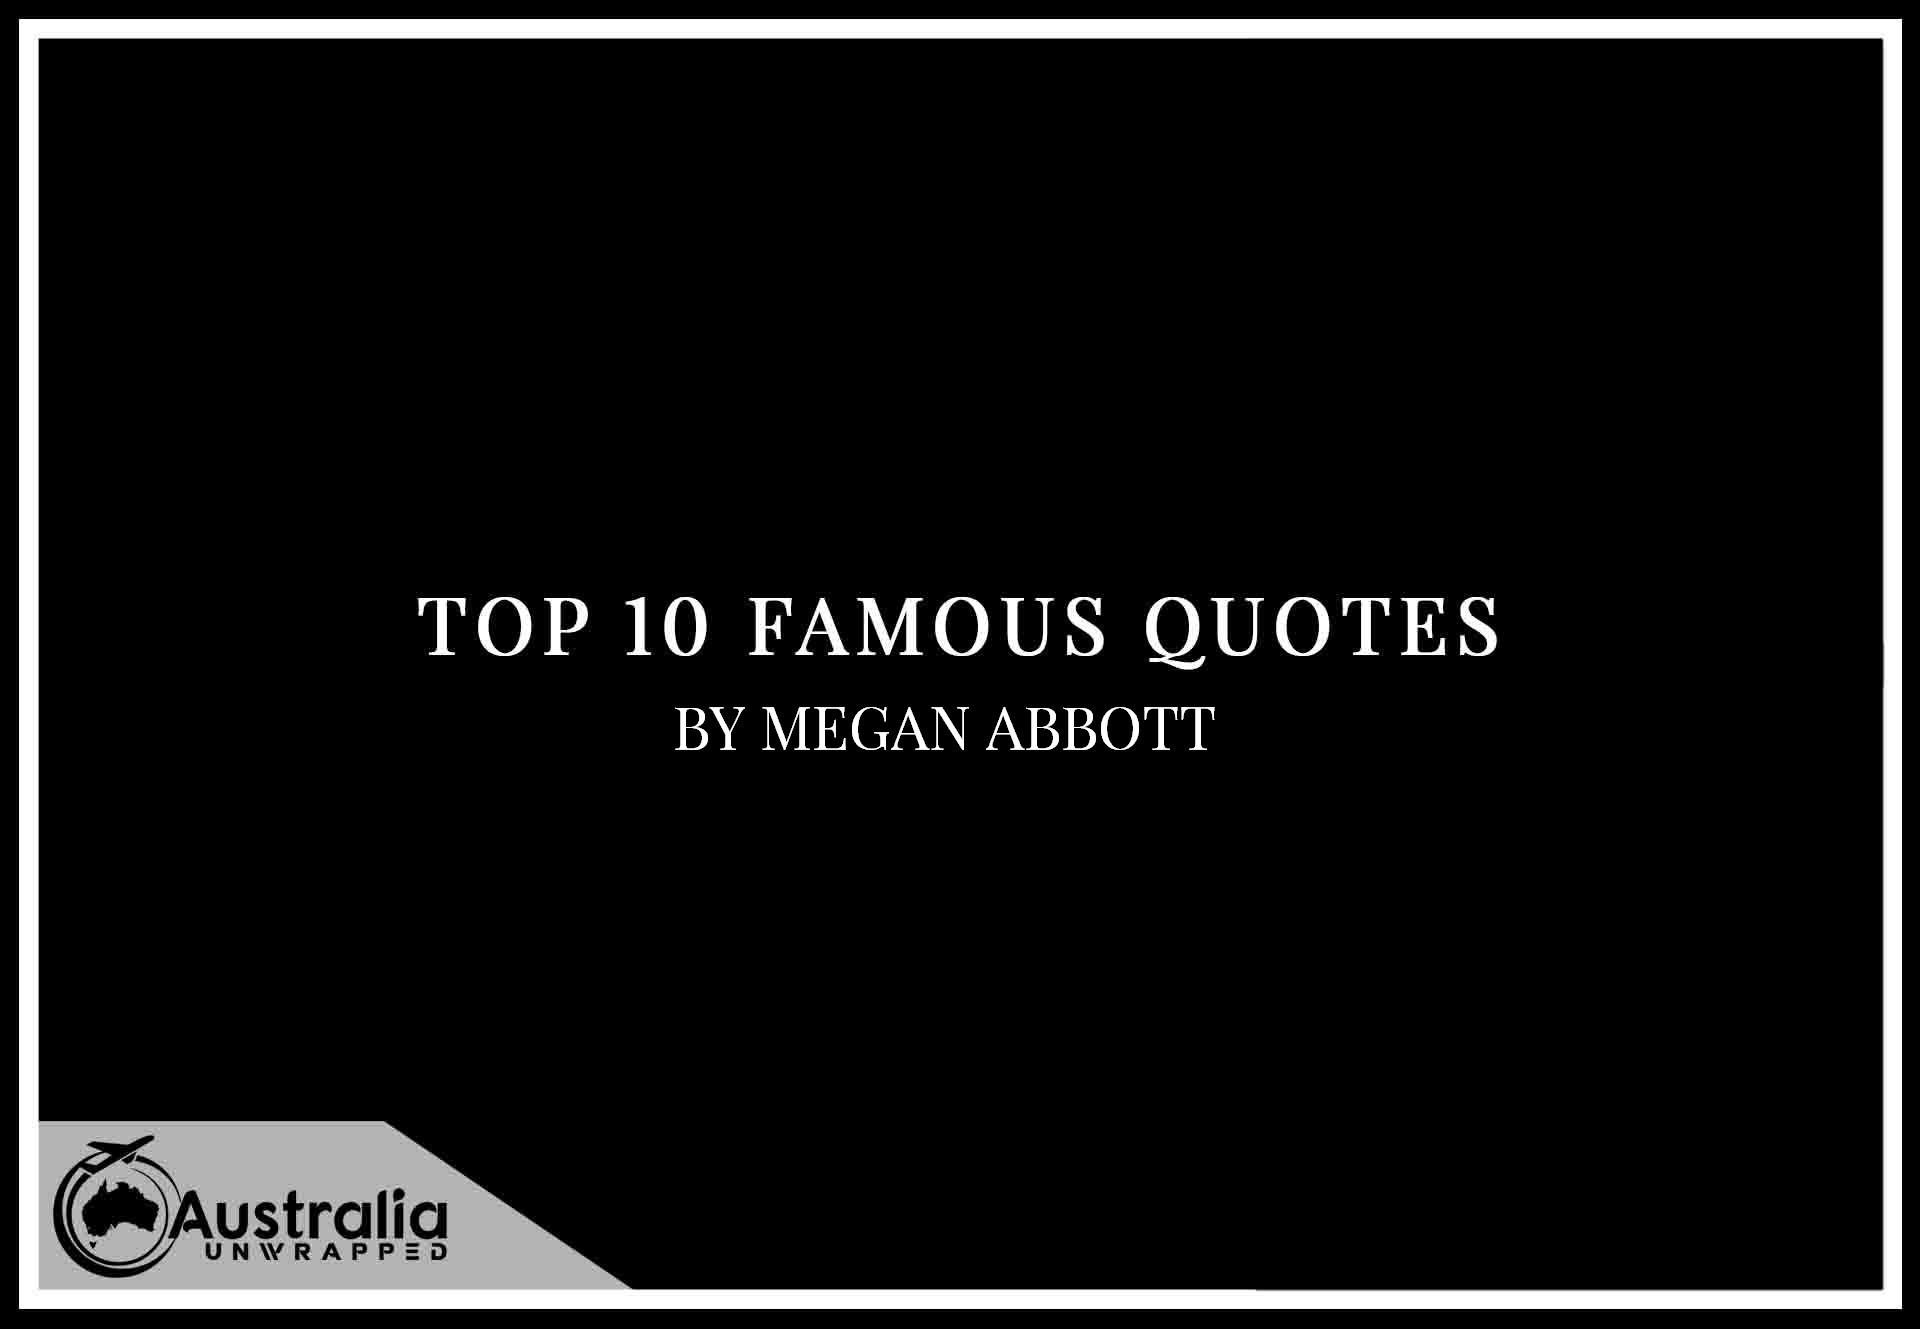 Top 10 Famous Quotes by Author Megan Abbott